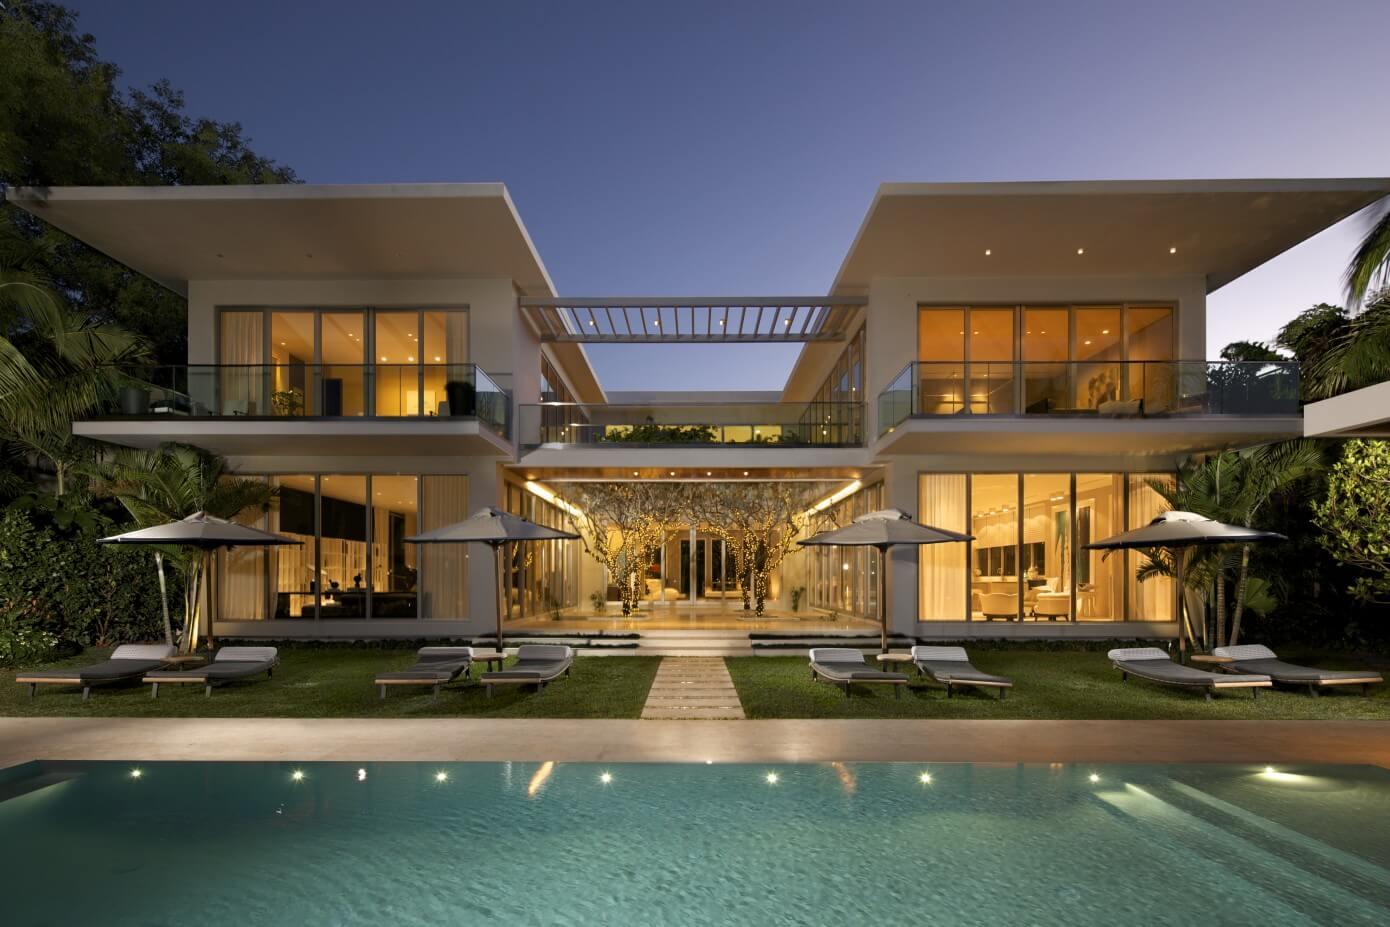 Kobi Karp Architecture Interior Design North Miami Beach